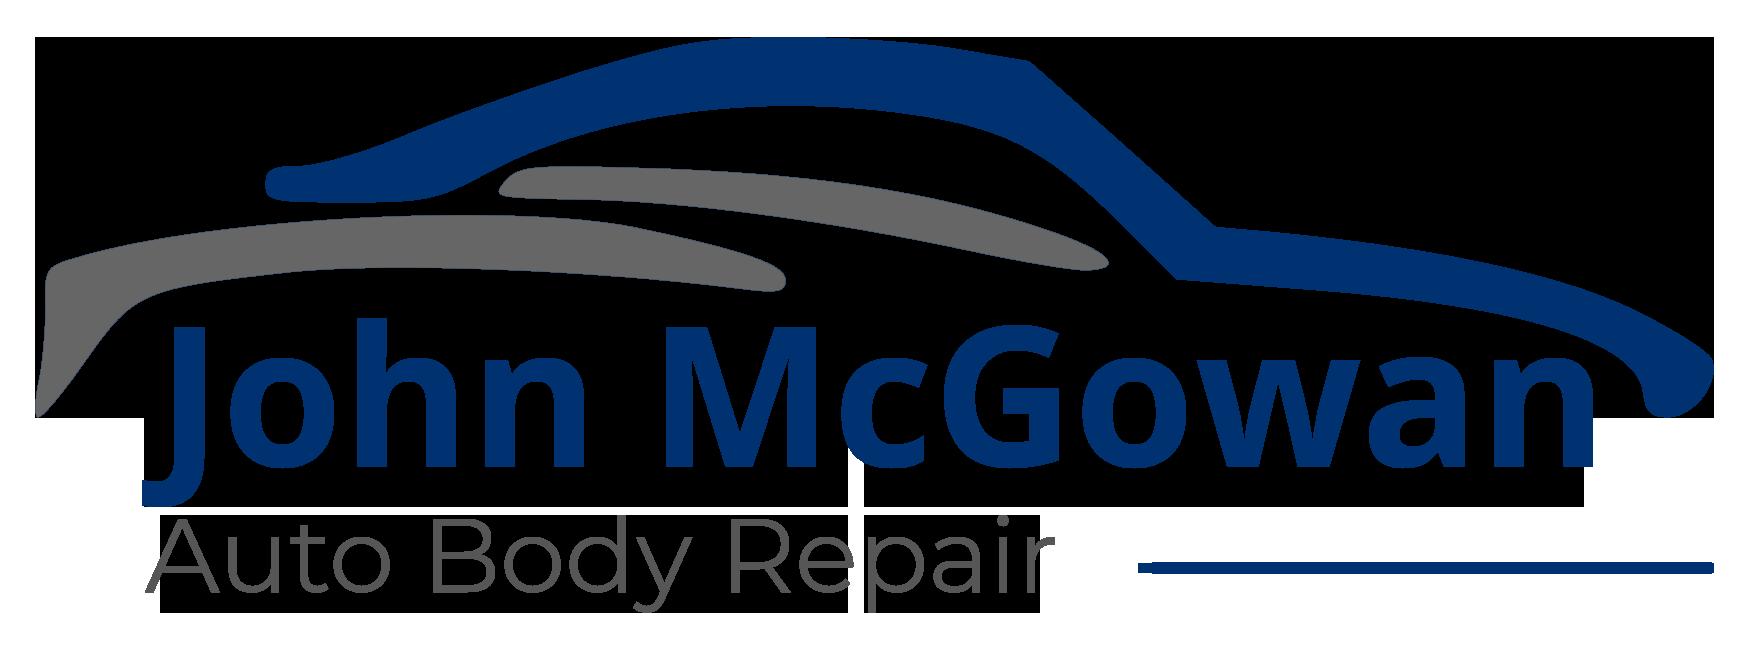 The John McGowan Auto Body Repair Logo